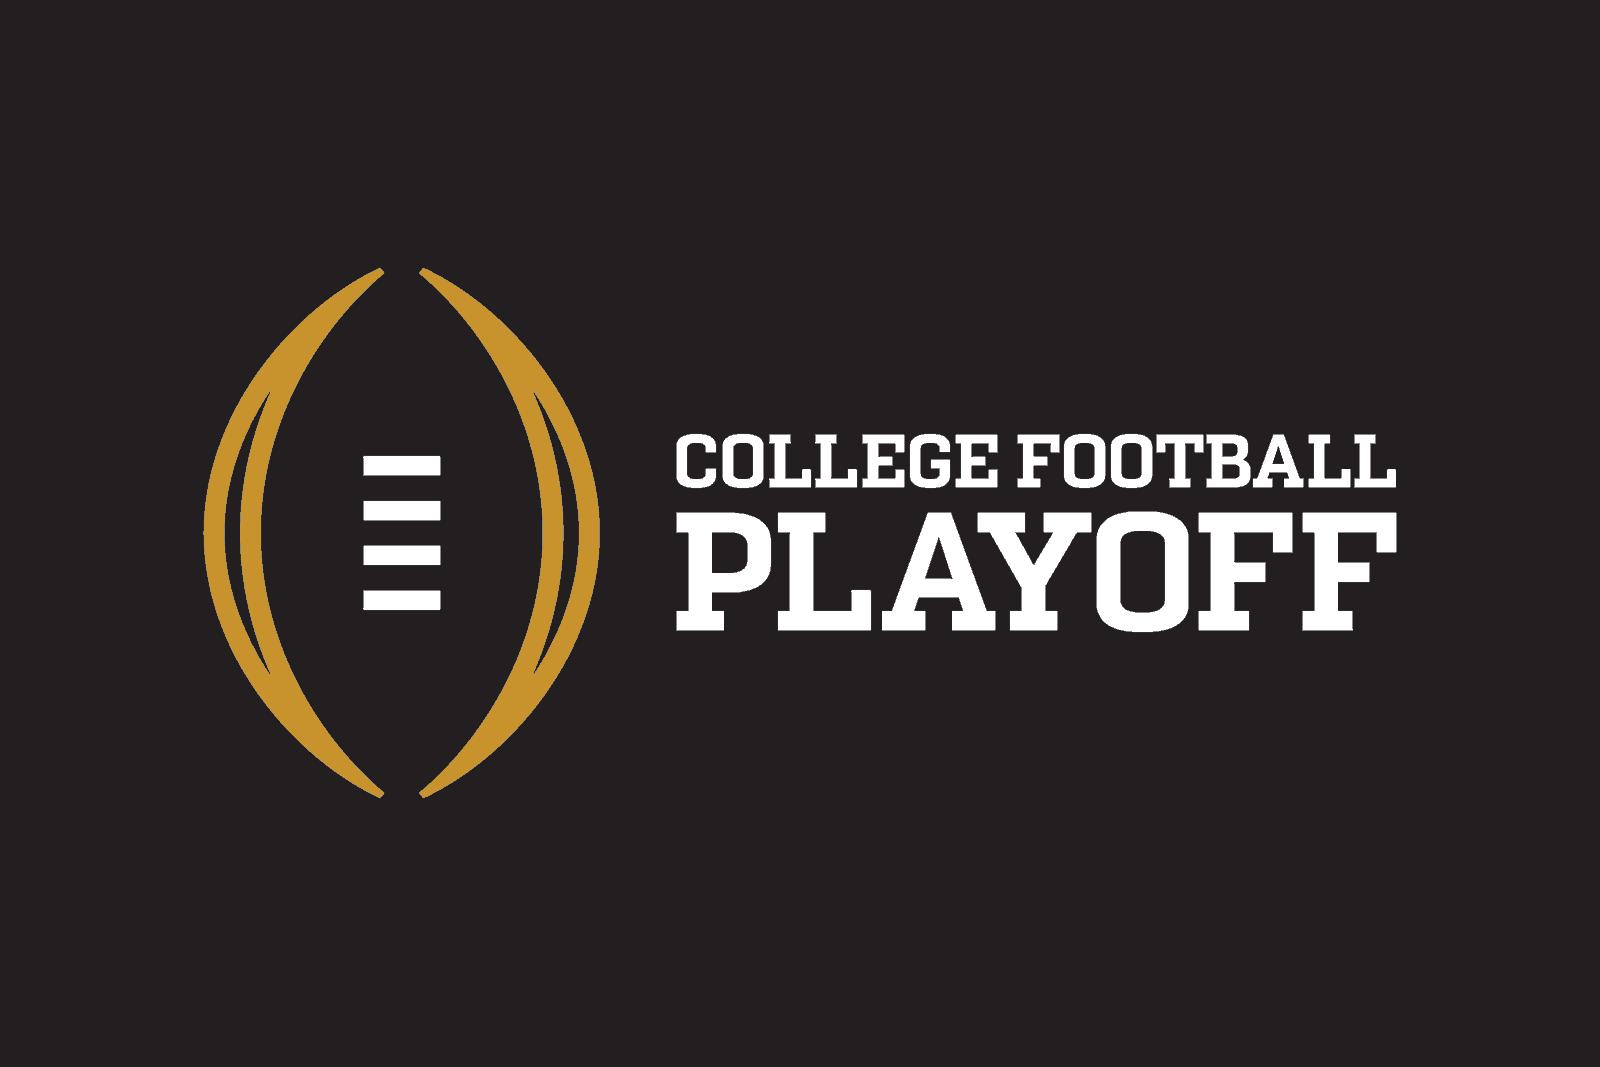 College Football Playoff Schedule